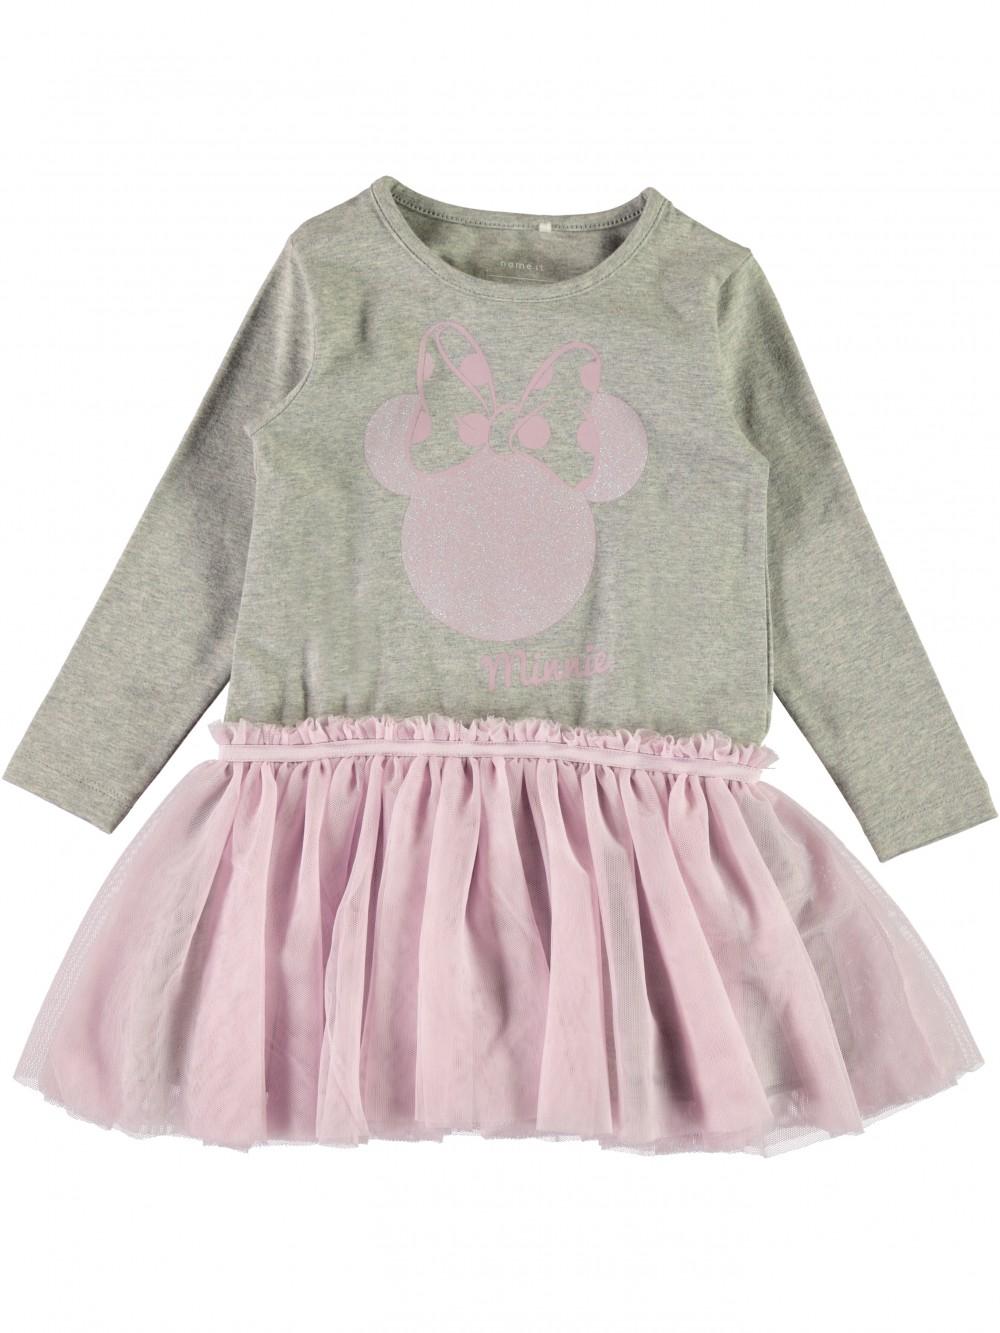 6cce511a Name It Minnie Mus, rosa og grå tyllkjole – Mio Trend